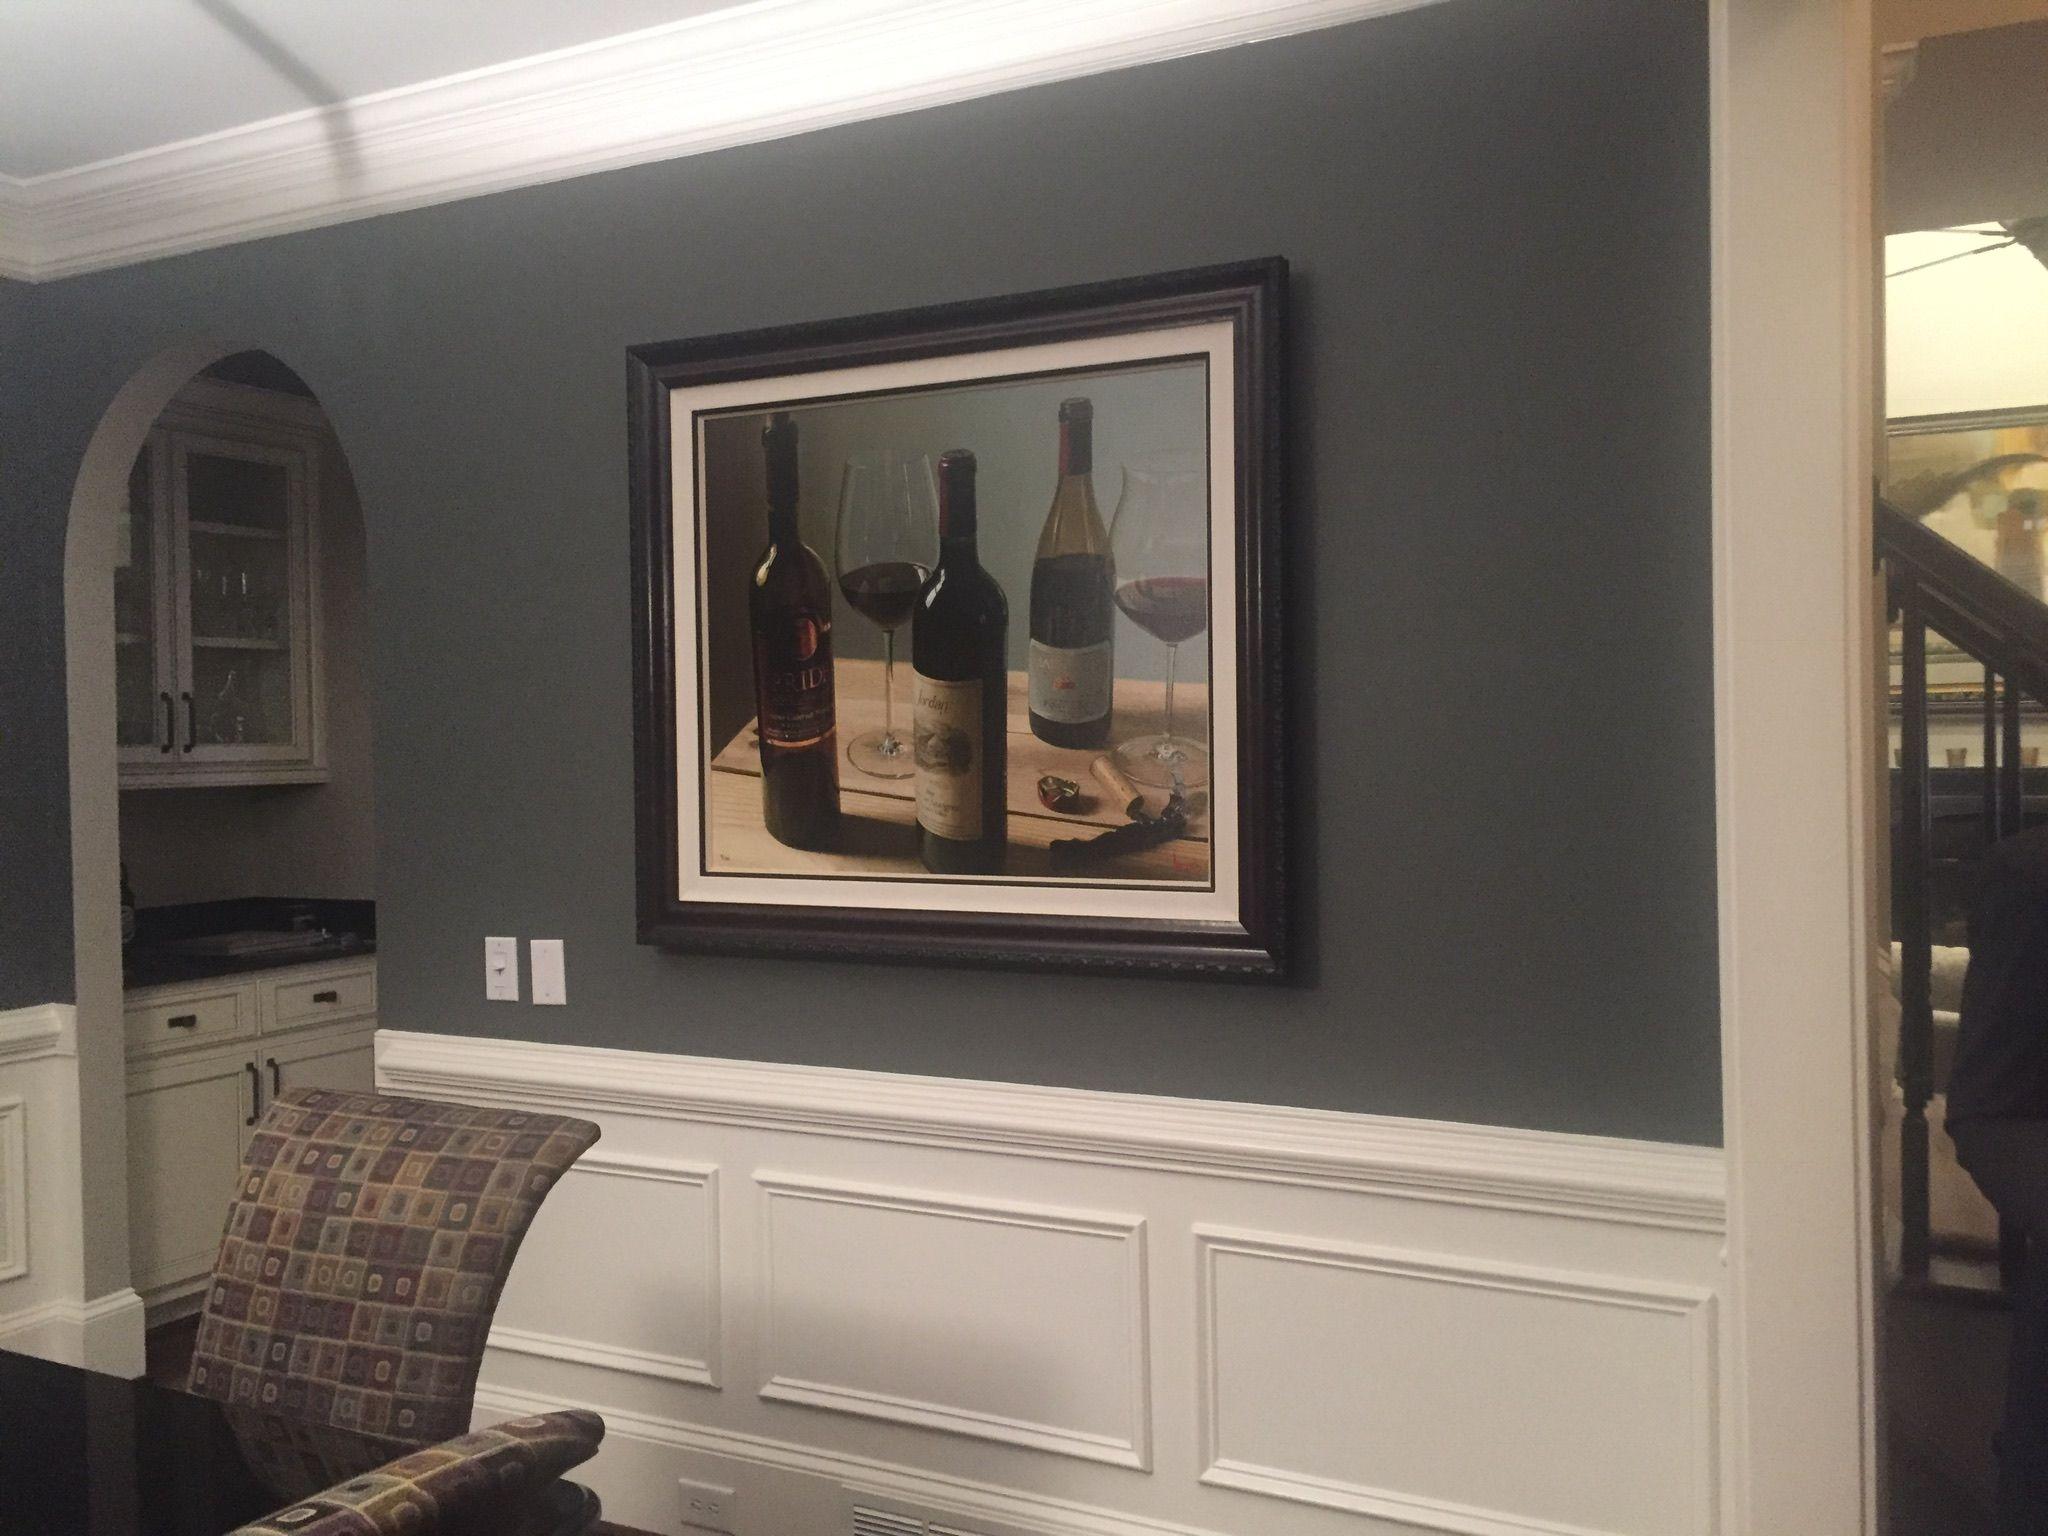 benjamin moore hc 167 amherst gray color consultations. Black Bedroom Furniture Sets. Home Design Ideas